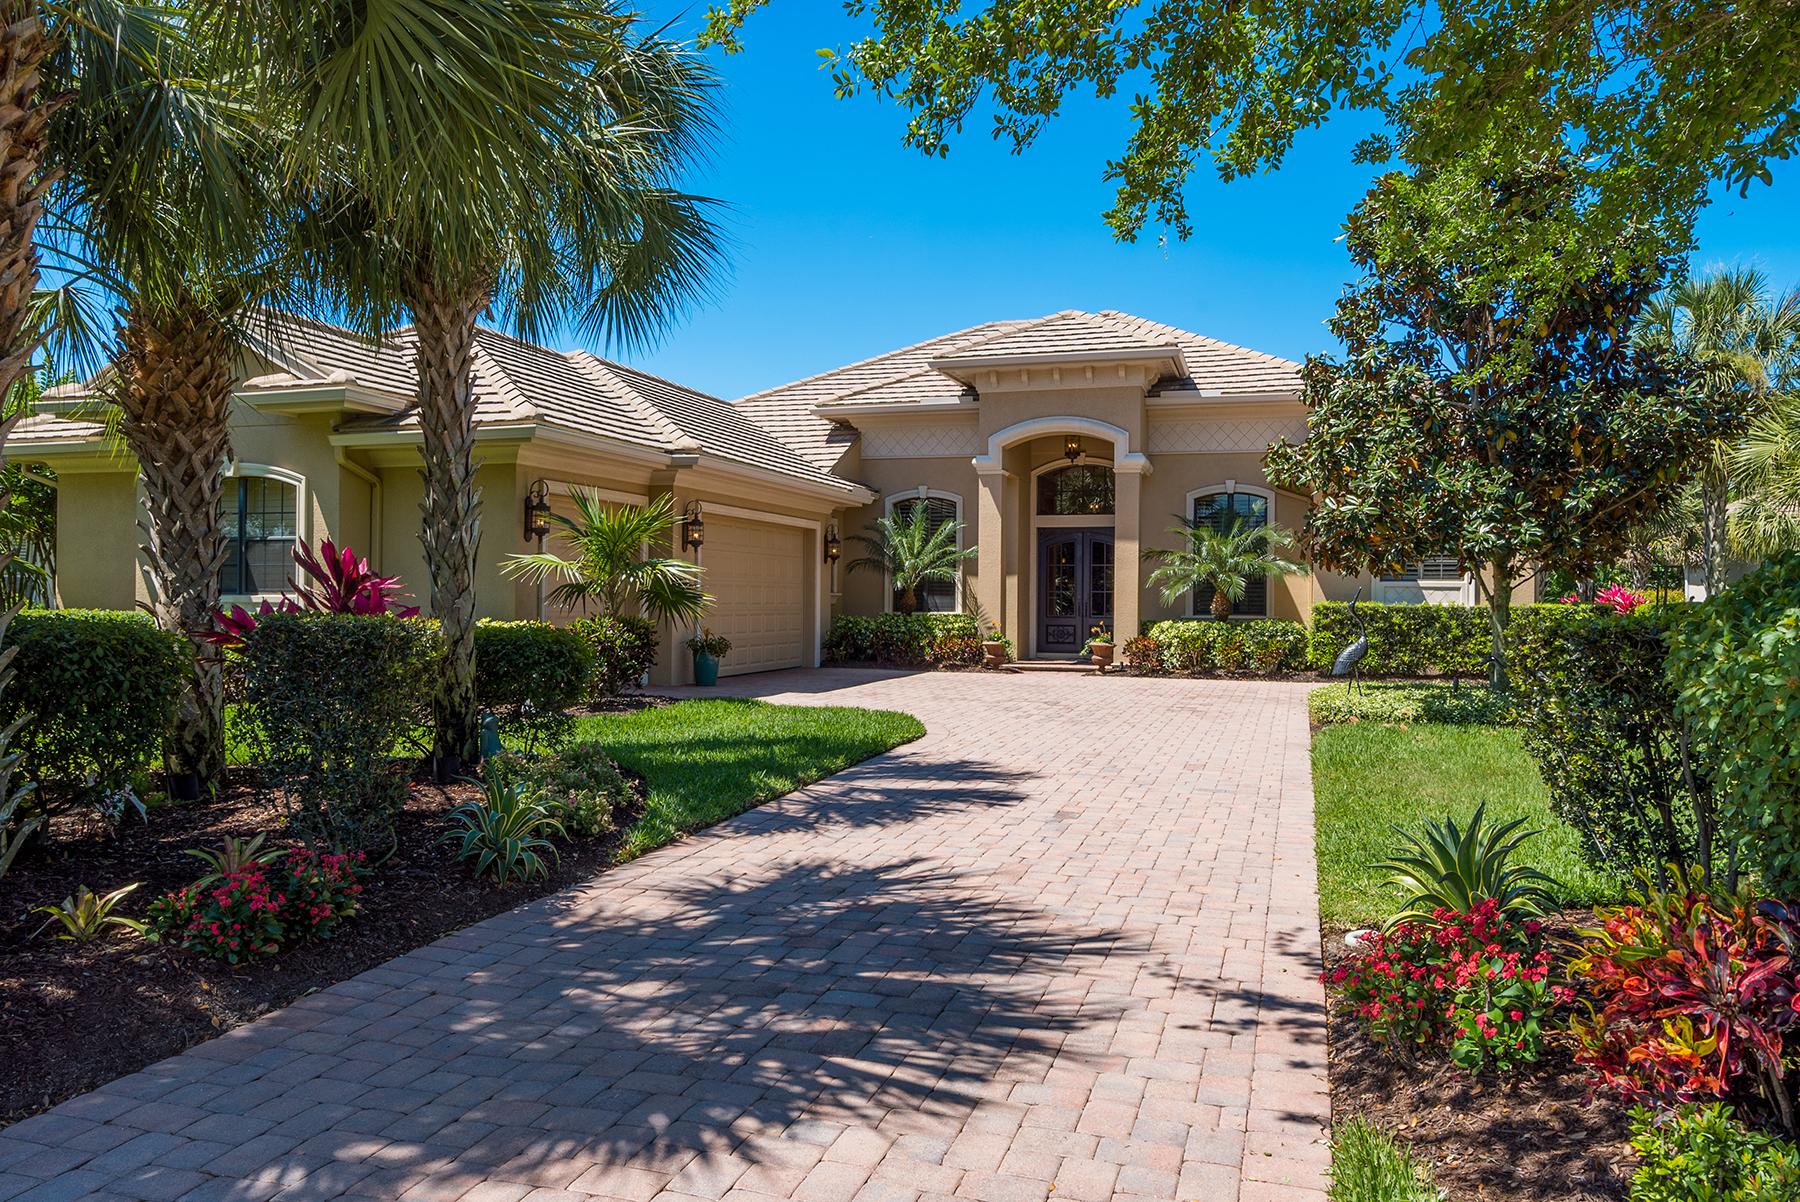 Single Family Home for Sale at FOUNDERS CLUB 3775 Caledonia Ln Sarasota, Florida, 34240 United States